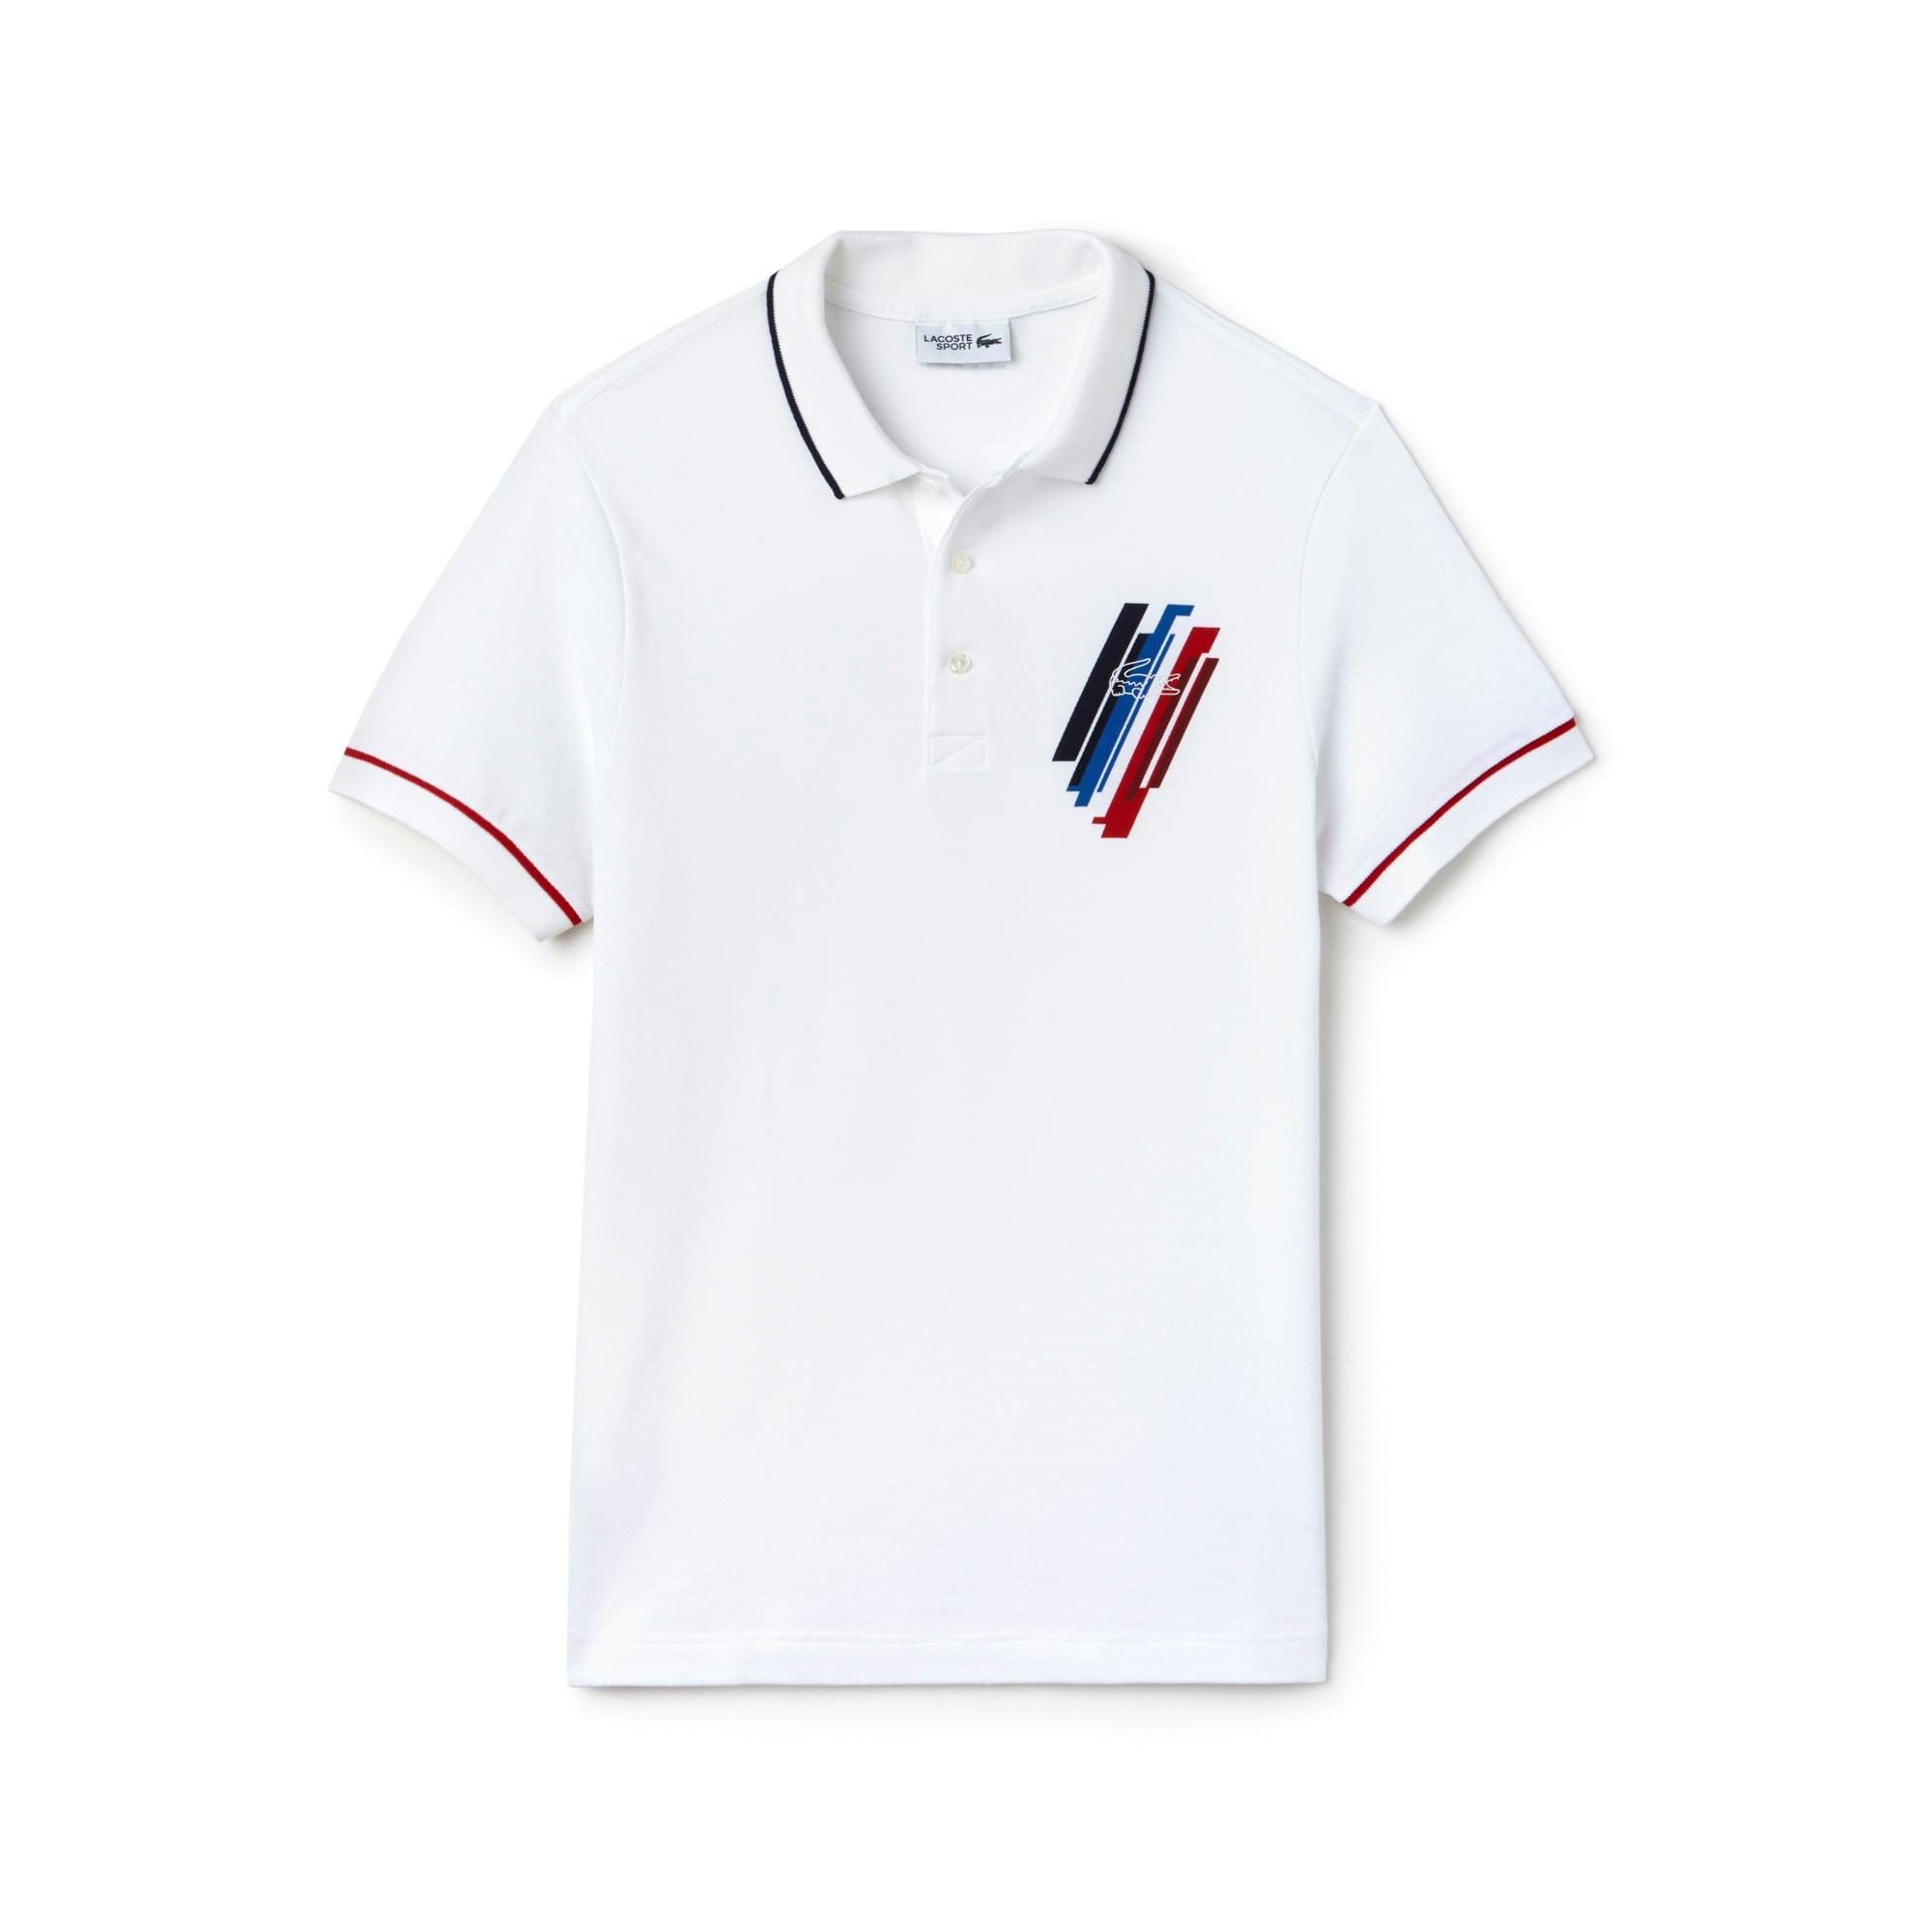 قميص بولو Lacoste رجالي بألوان متنوعة من مجموعة SPORT TRICOLOR